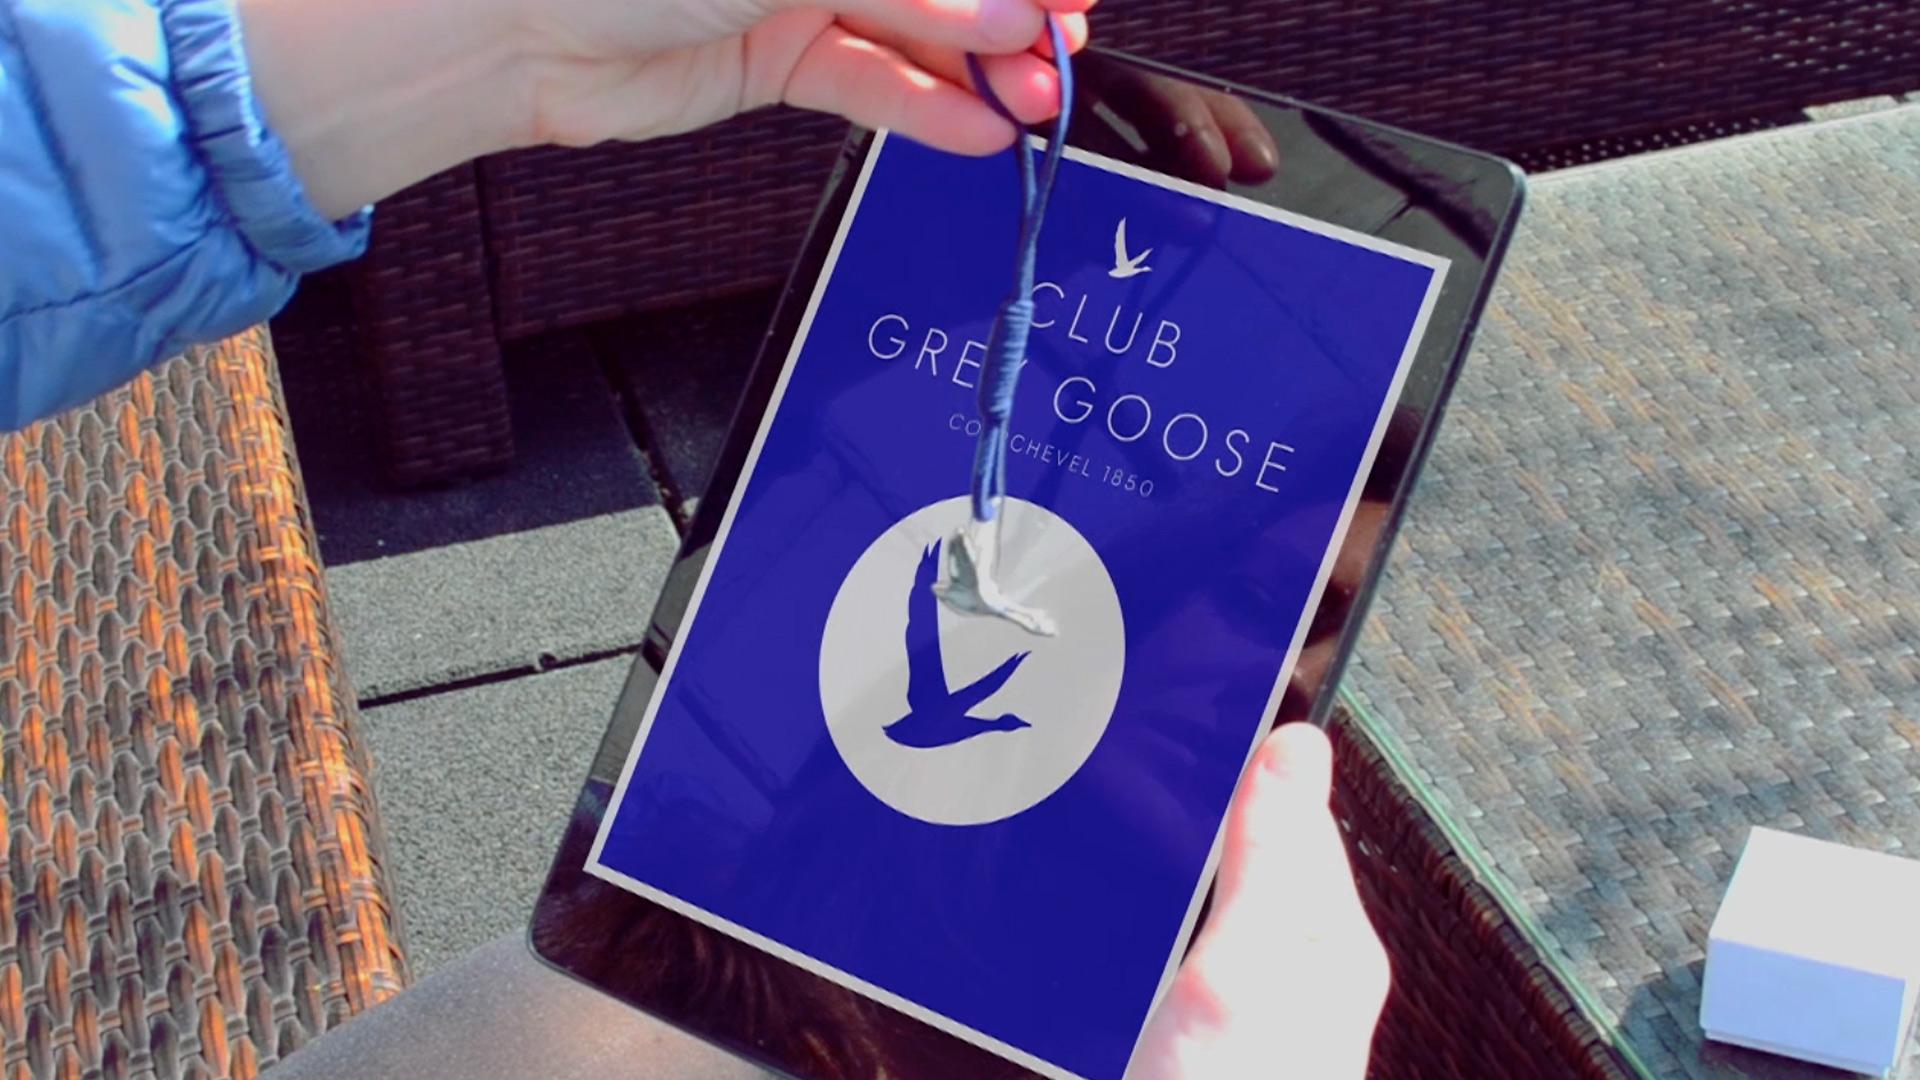 greygoose_cs_05.jpg